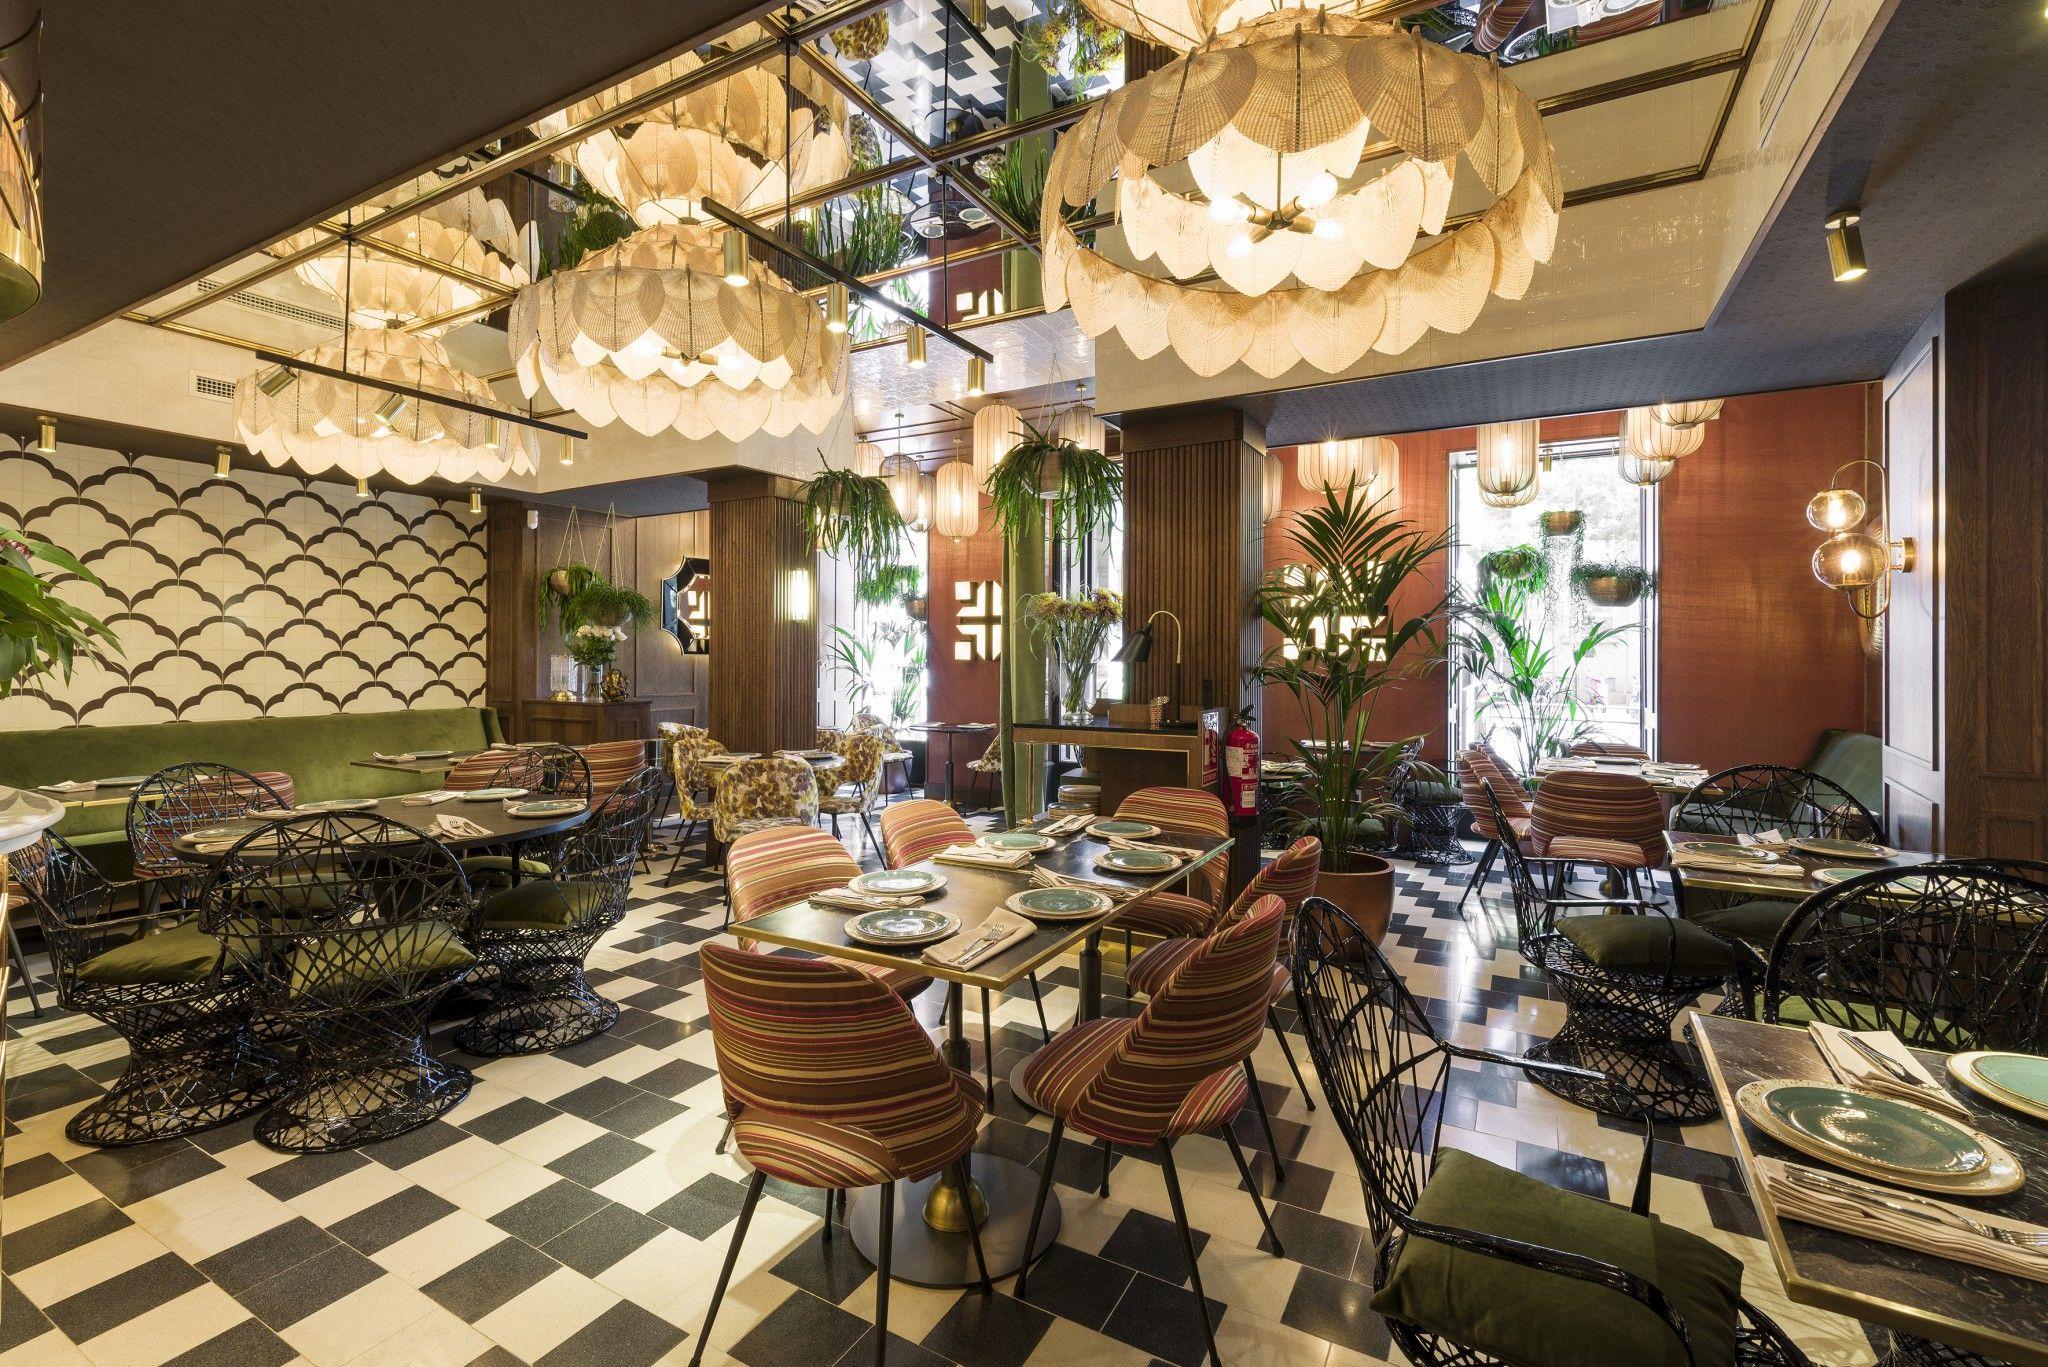 Asombroso Ideas De Diseño De Cocina De Un Restaurante Indio Fotos ...